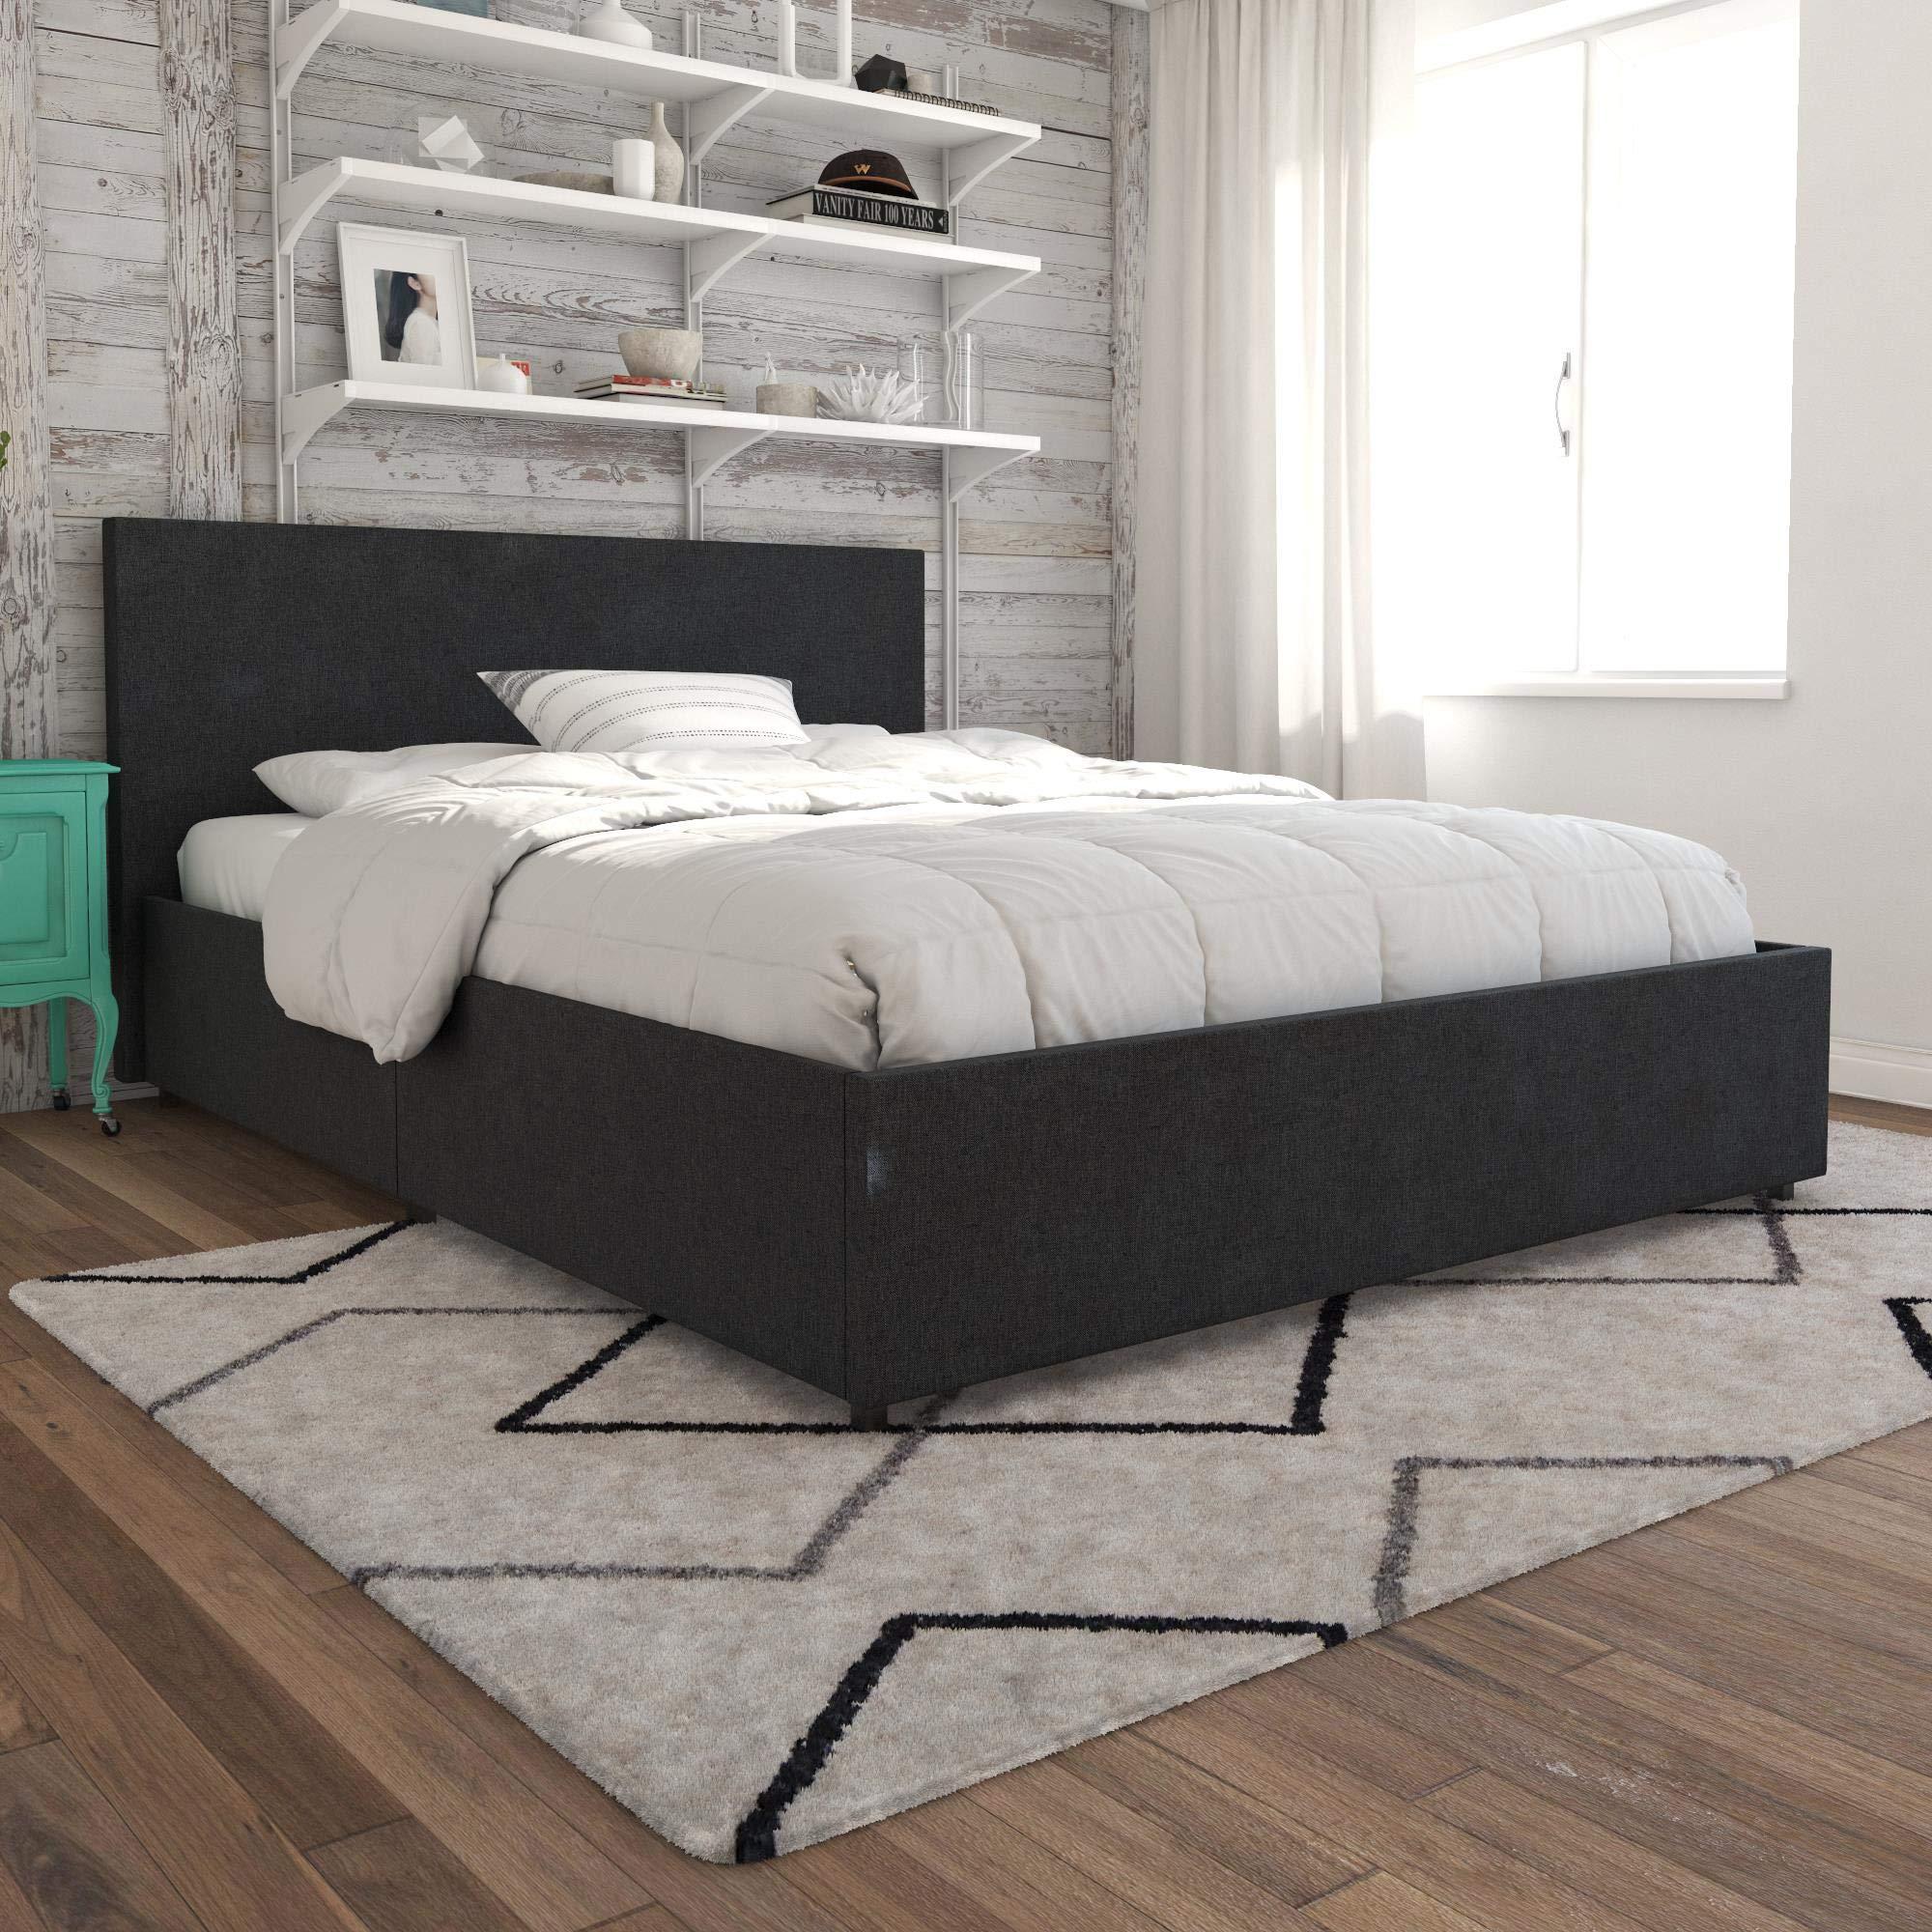 Novogratz Kelly Bed with Storage, Queen, Dark Gray Linen by Novogratz (Image #10)